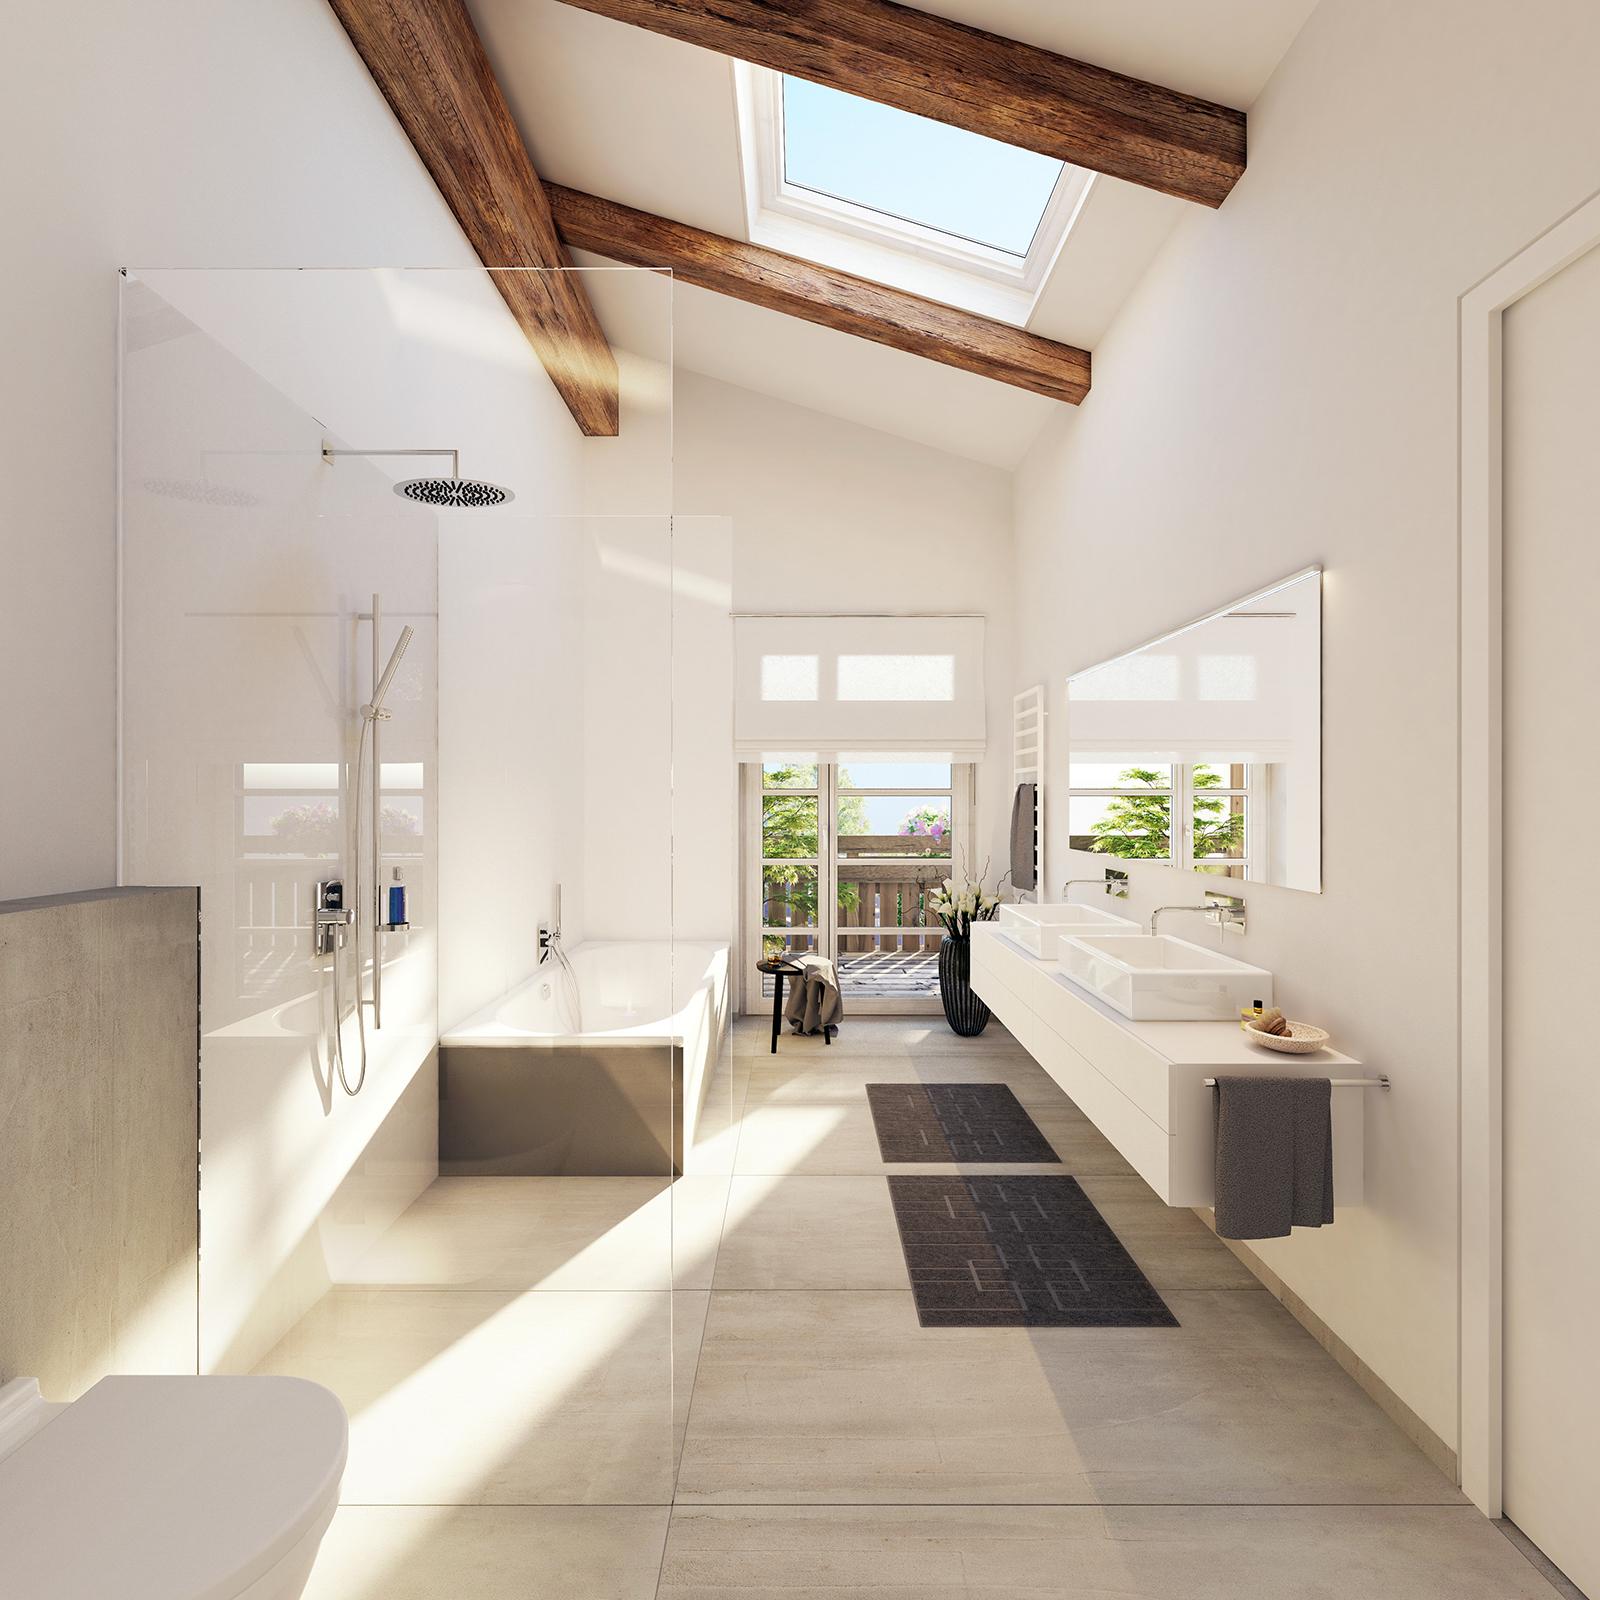 quartier-tegernsee-interior-badezimmer.jpg